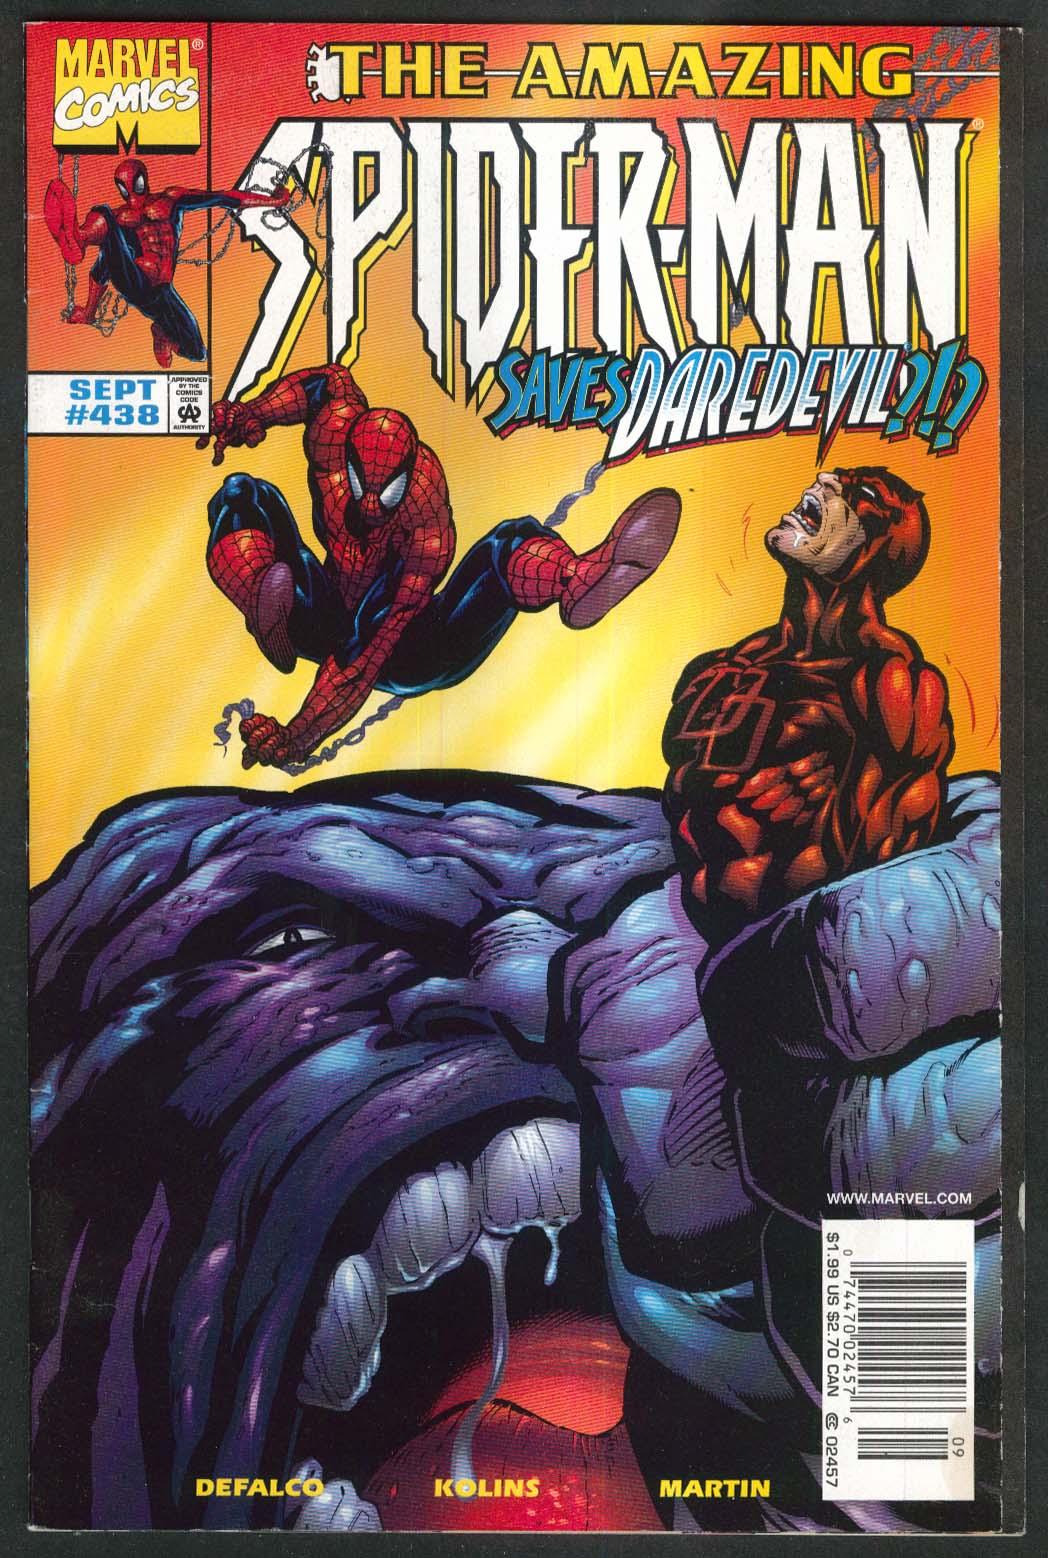 AMAZING SPIDER-MAN #438 Marvel comic book 9 1998